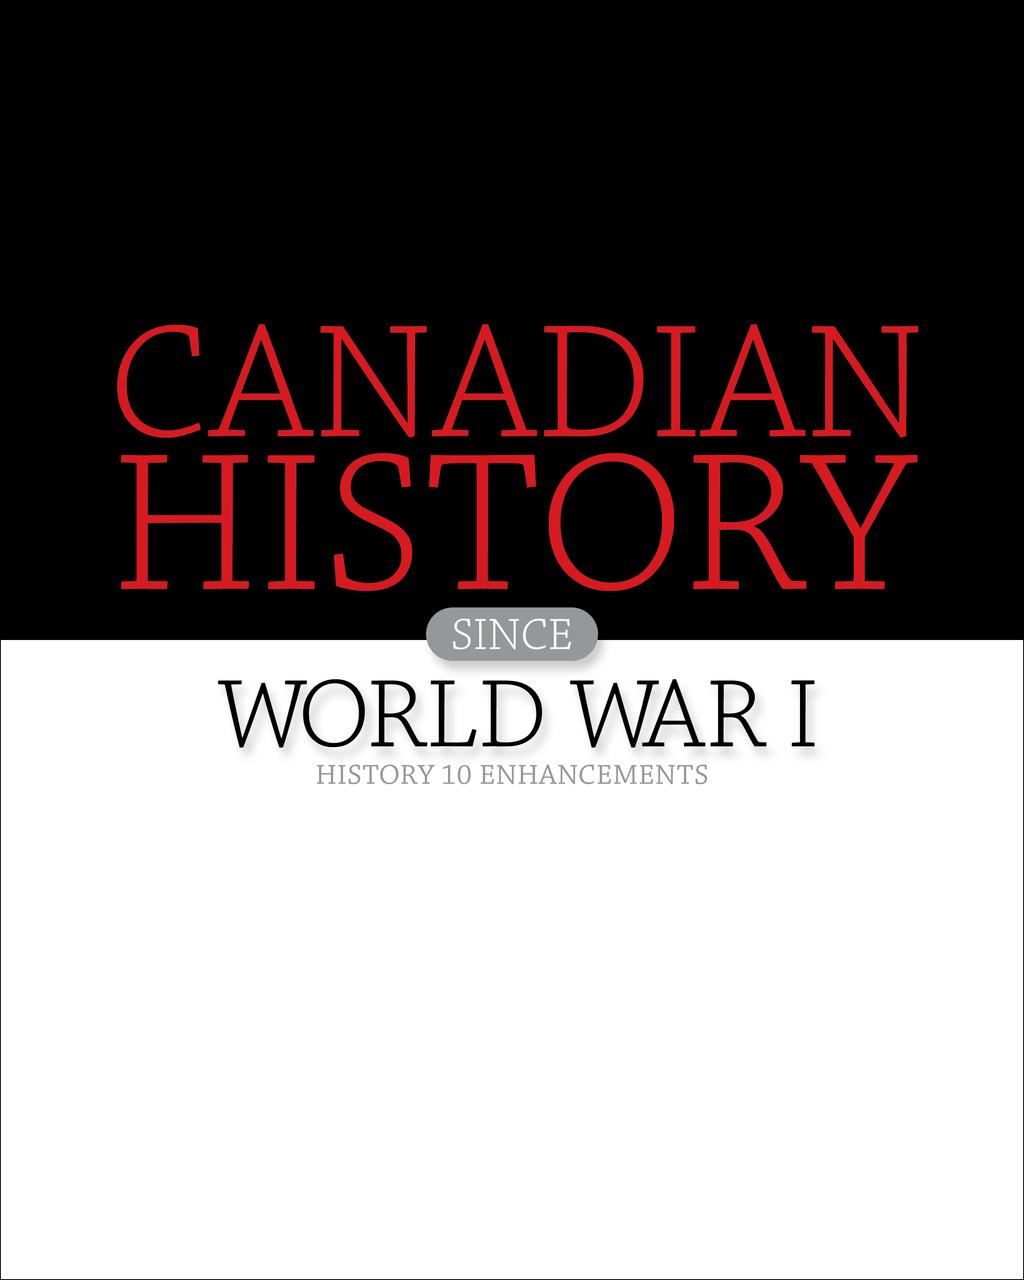 Grade 10 history cover